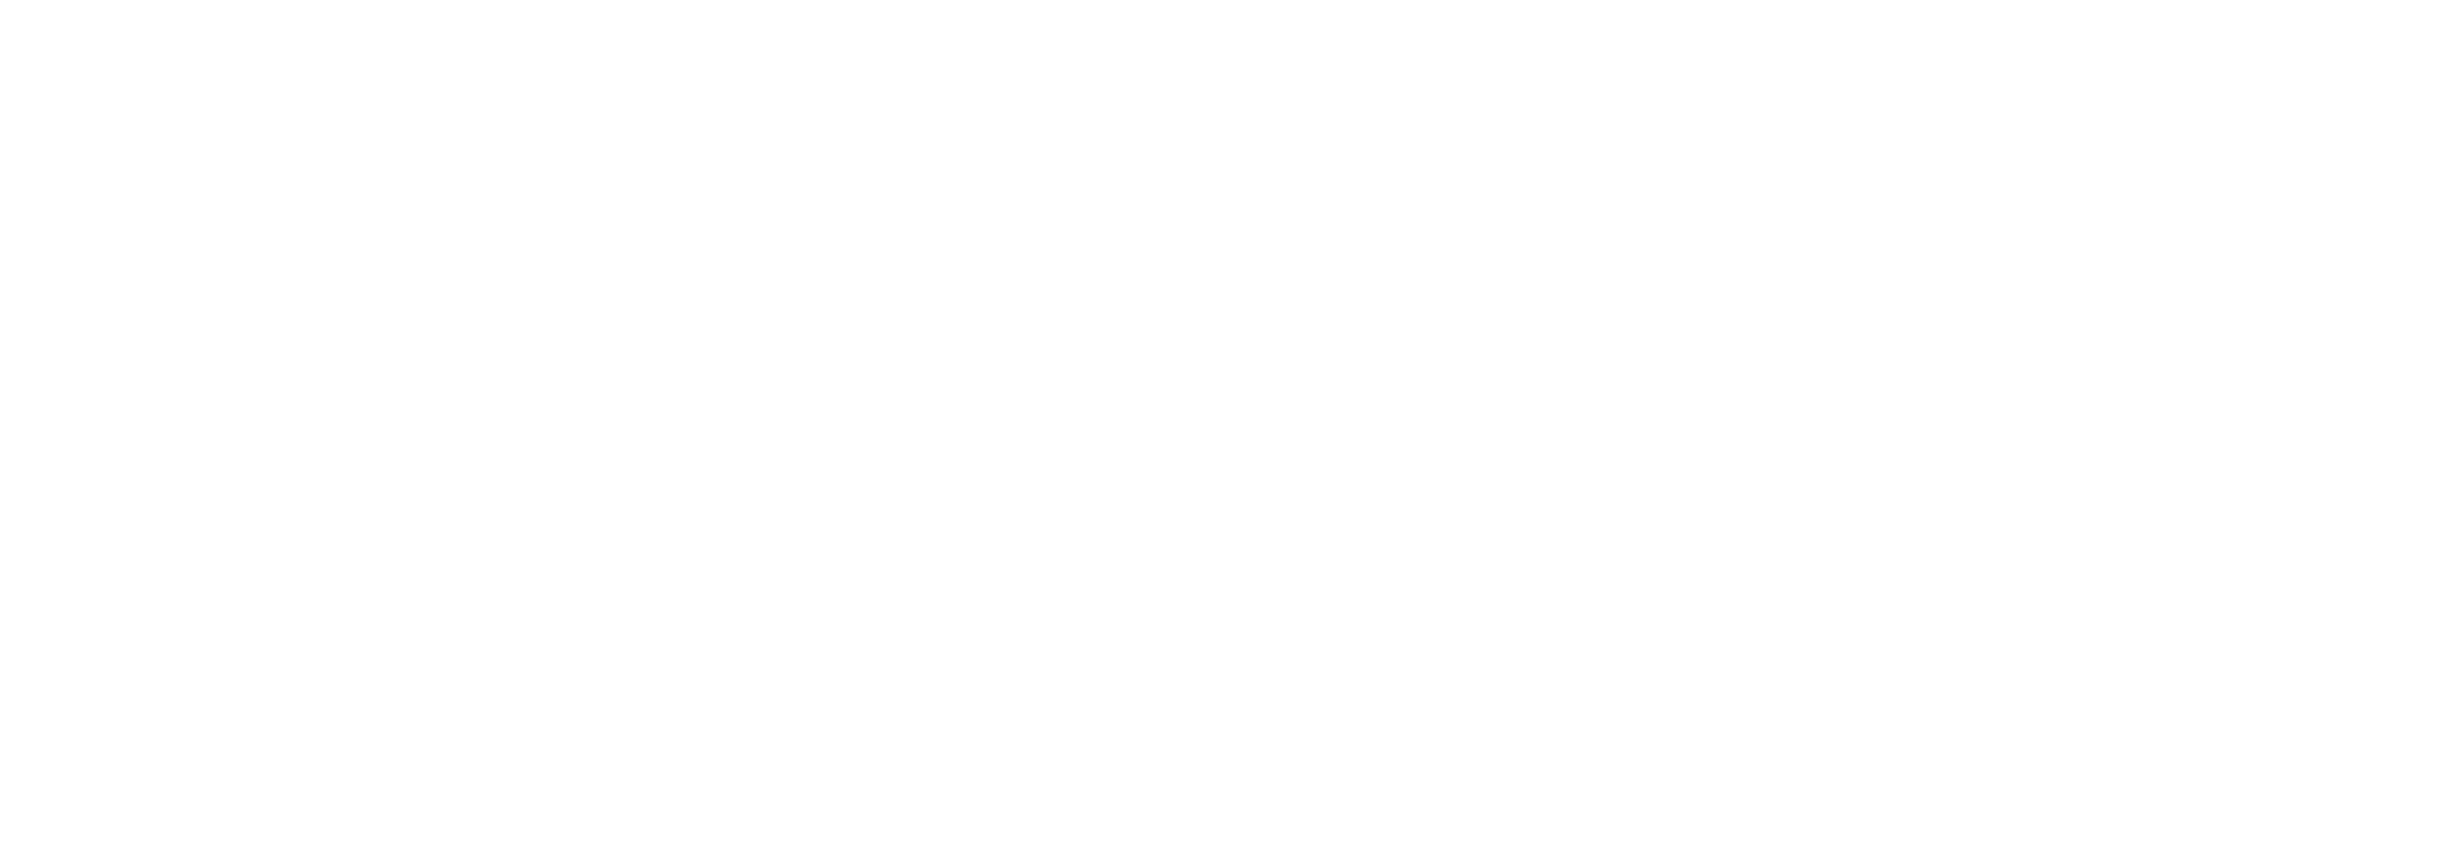 JIRO LOGO copy